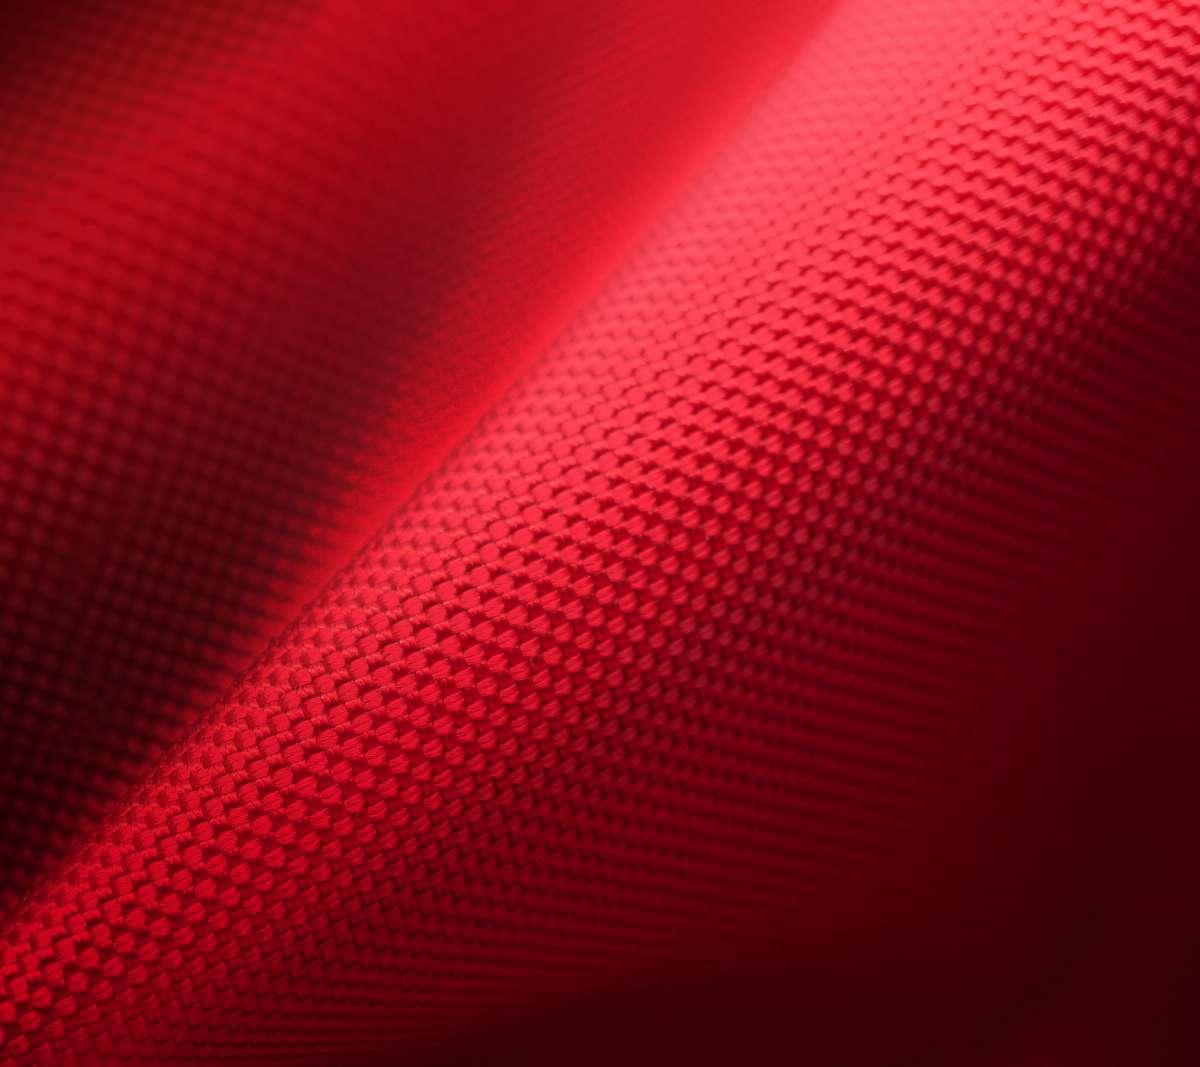 Motorola DROID Turbo Wallpapers: Droid Turbo 2 Wallpaper